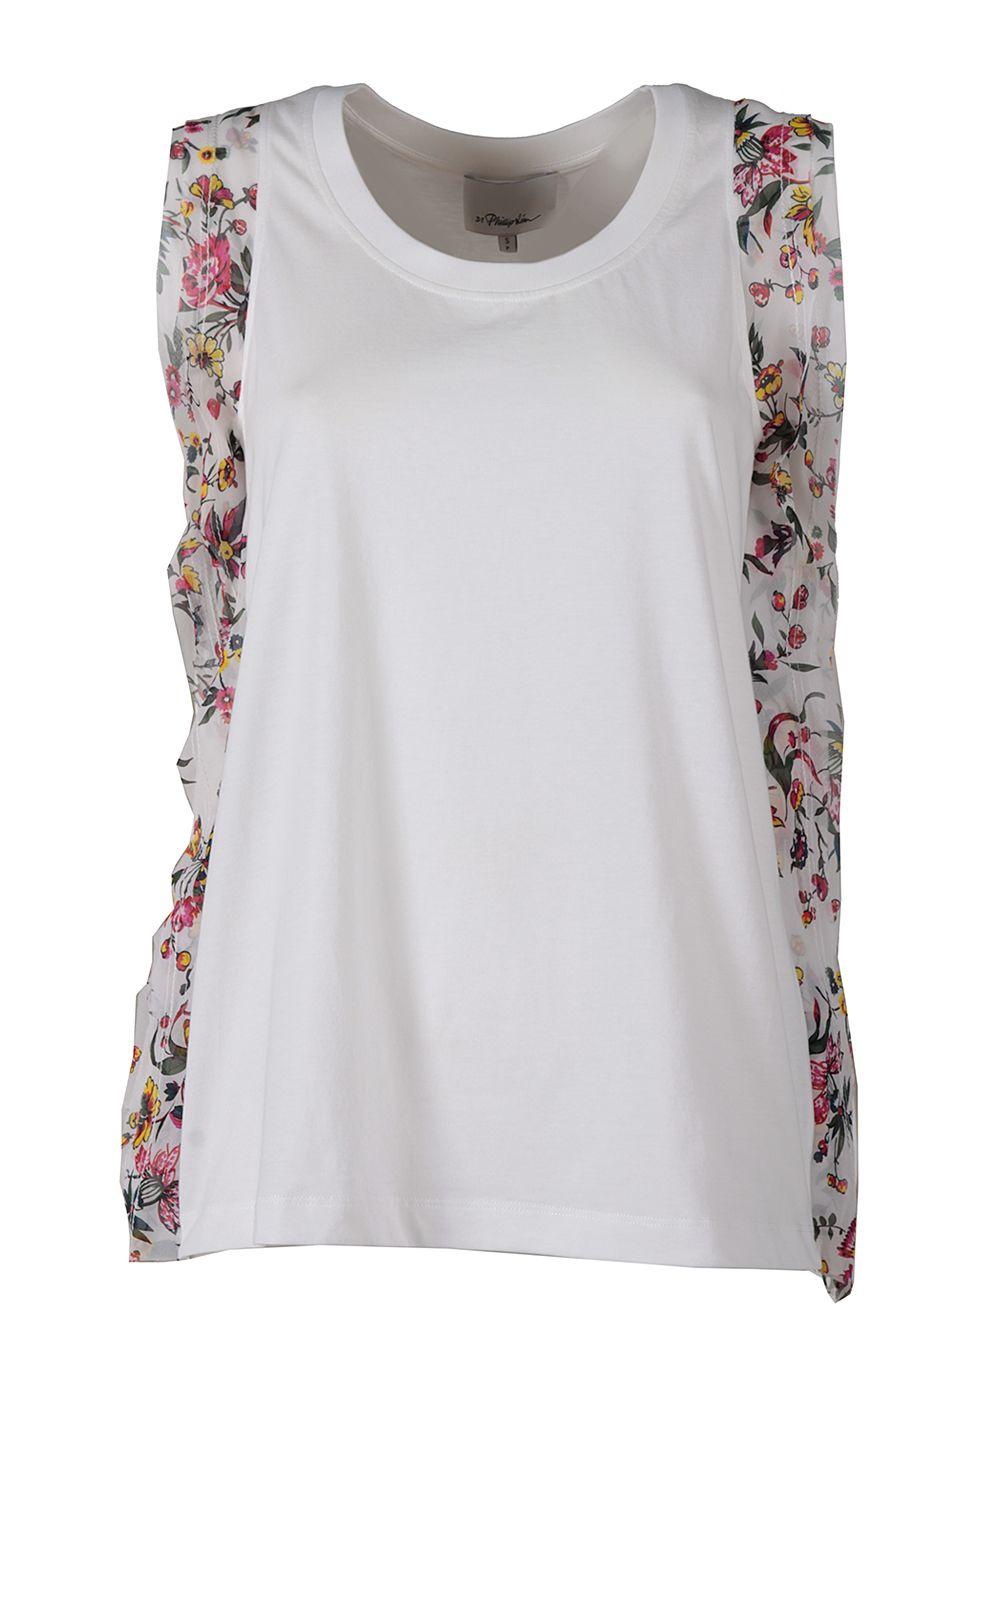 Buy Cheap Very Cheap Floral silk-ruffle cotton-jersey tank top 3.1 Phillip Lim Outlet Footlocker Comfortable Online iCD3q6bx19